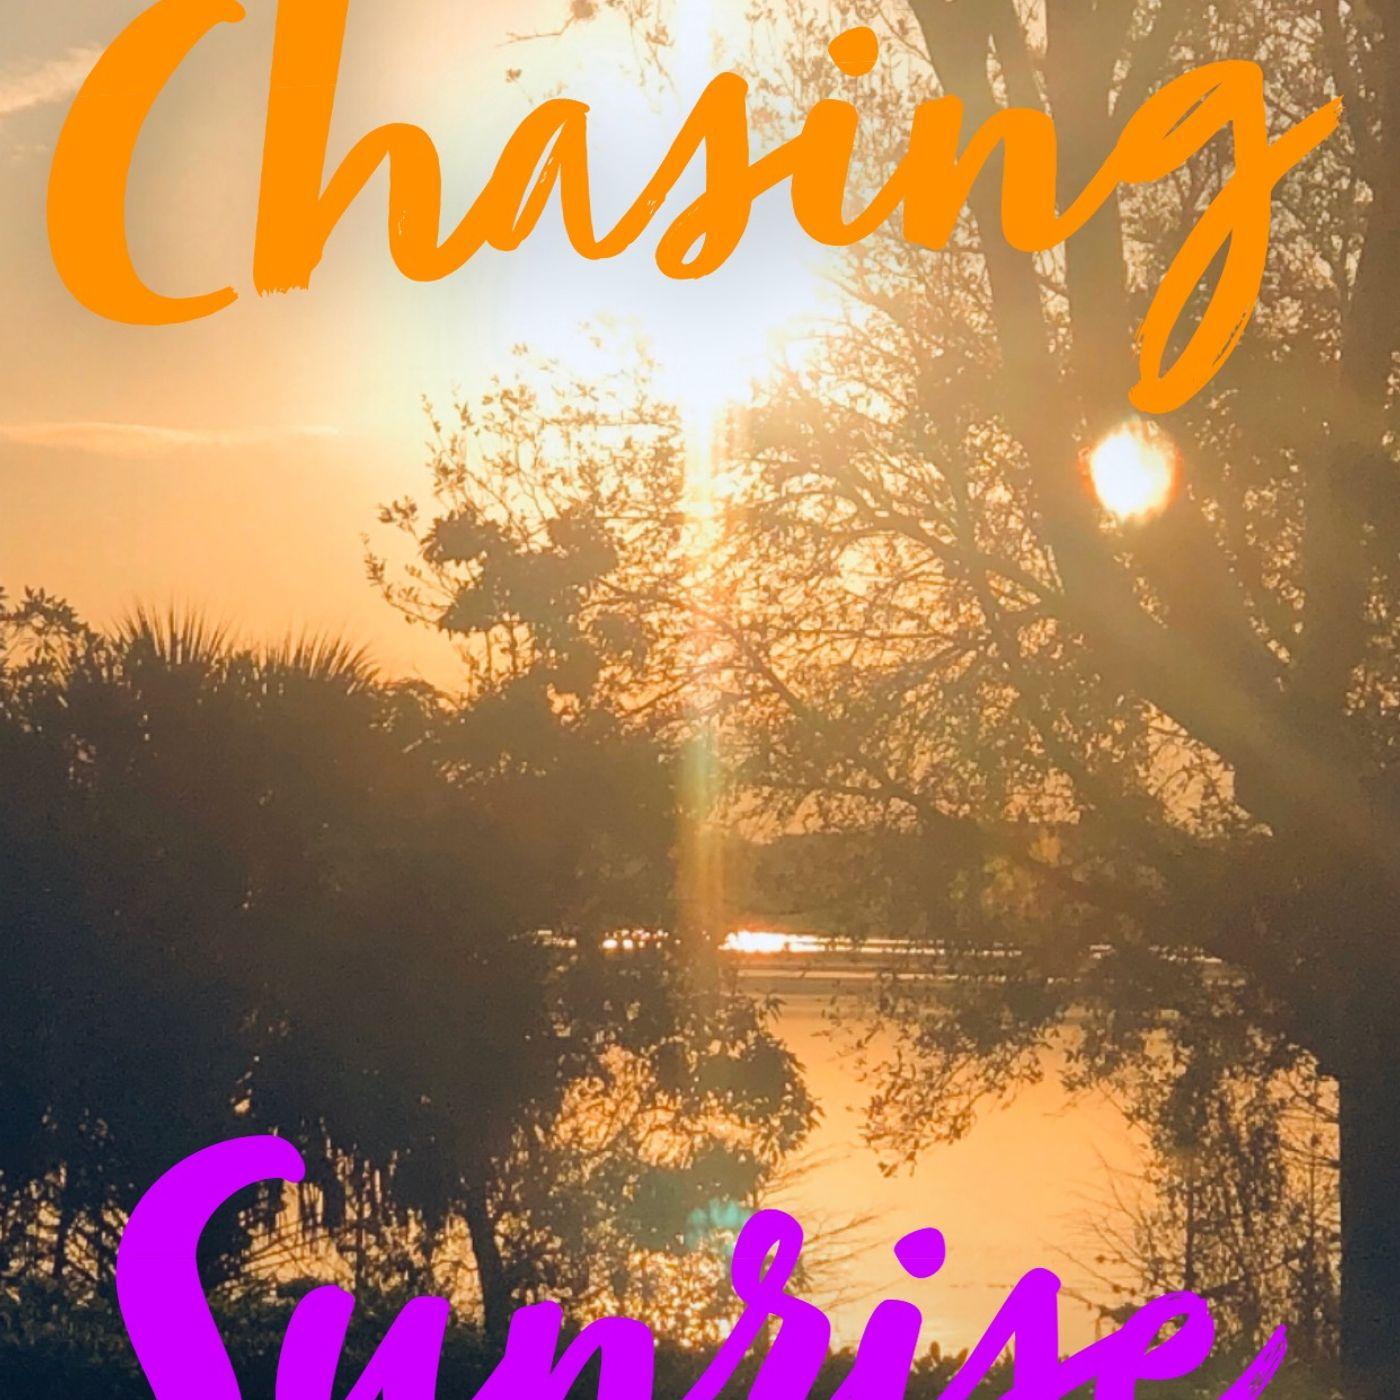 Chasing Sunrise/ Perpetual Perception